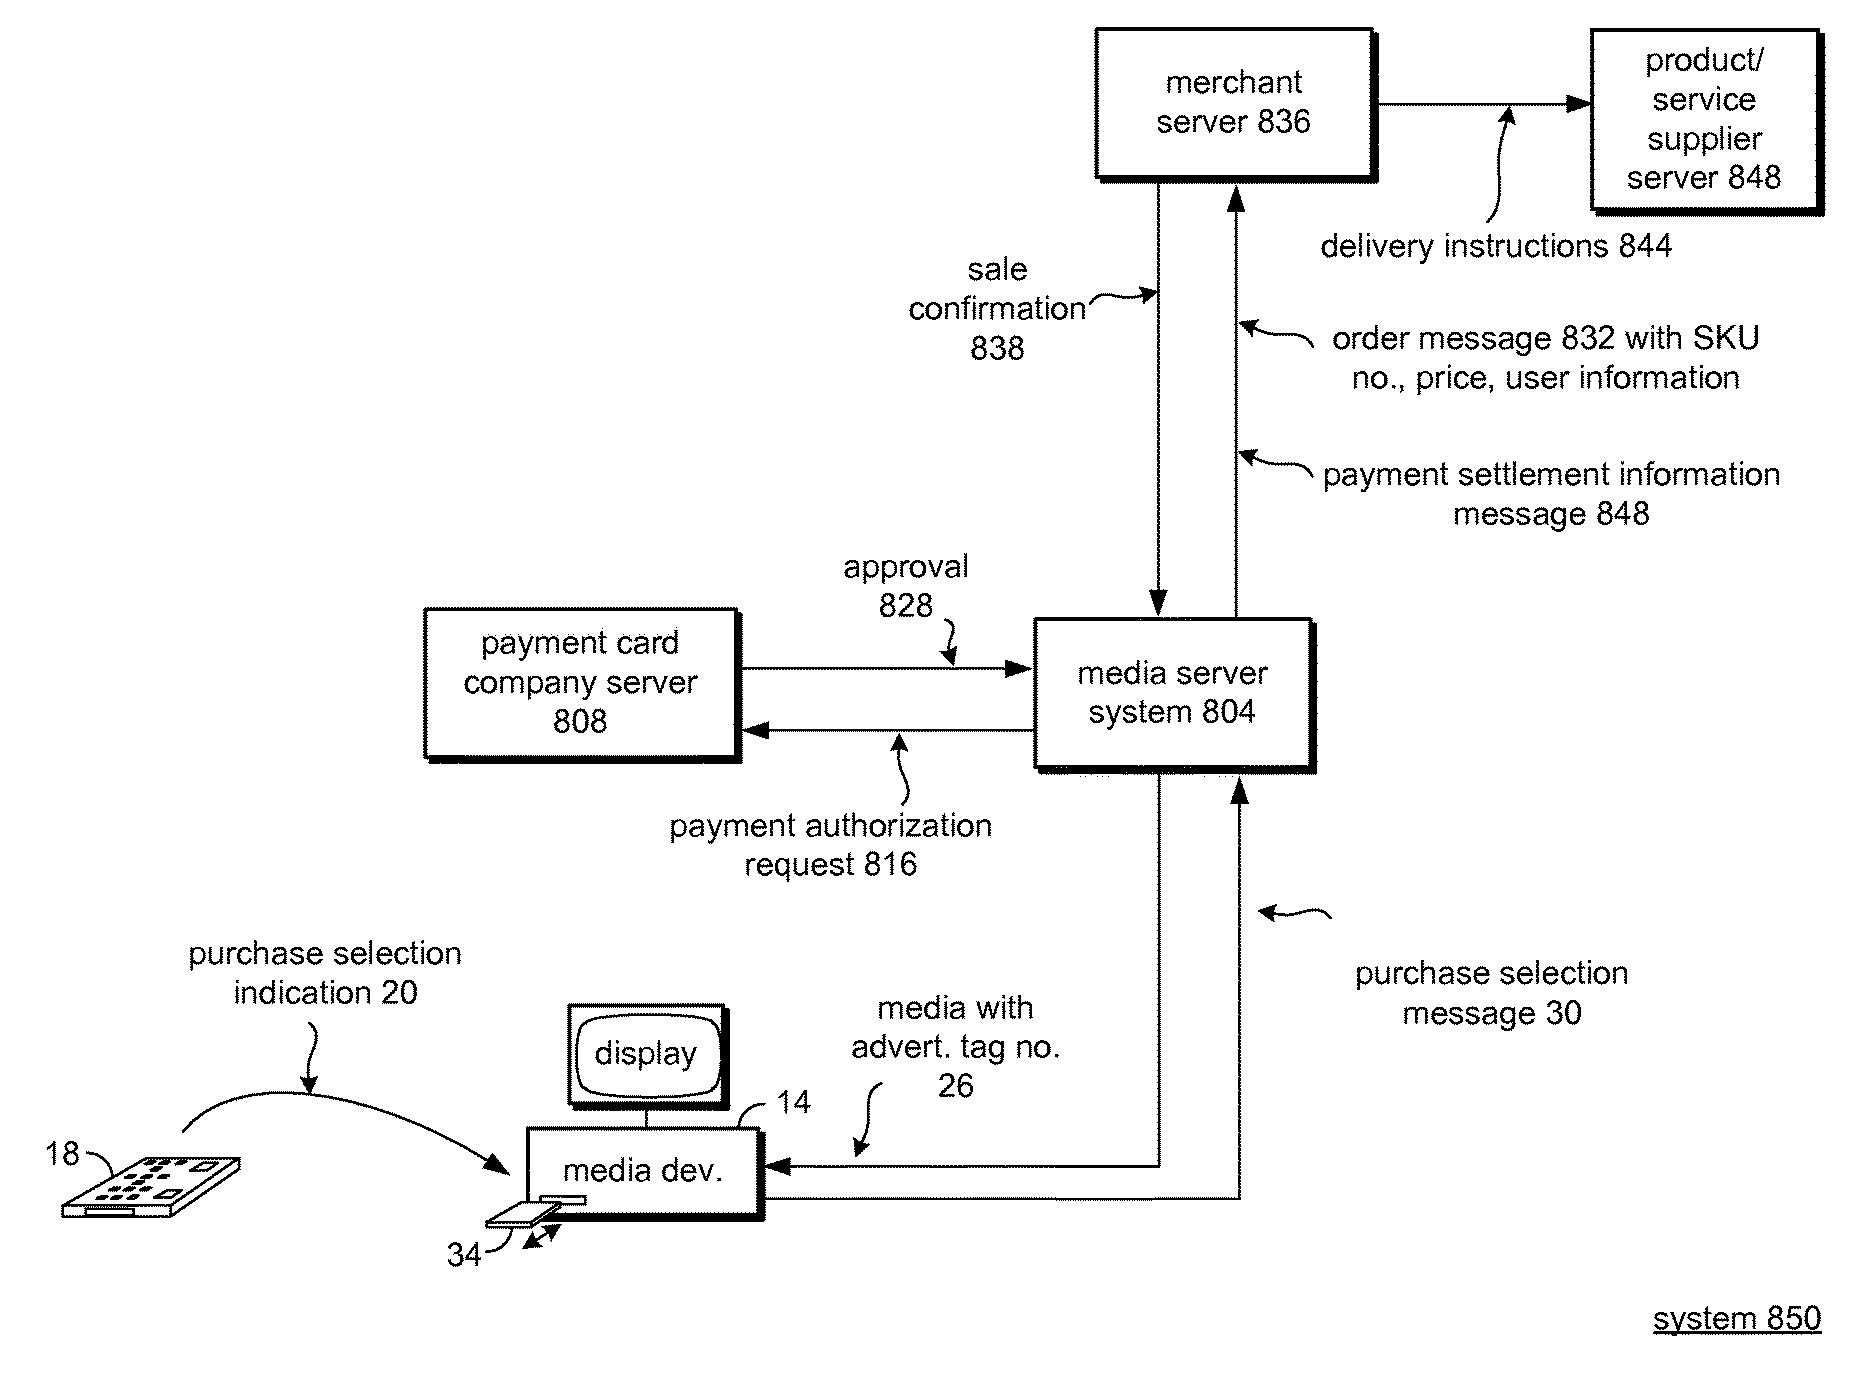 Patent US 9,805,347 B2